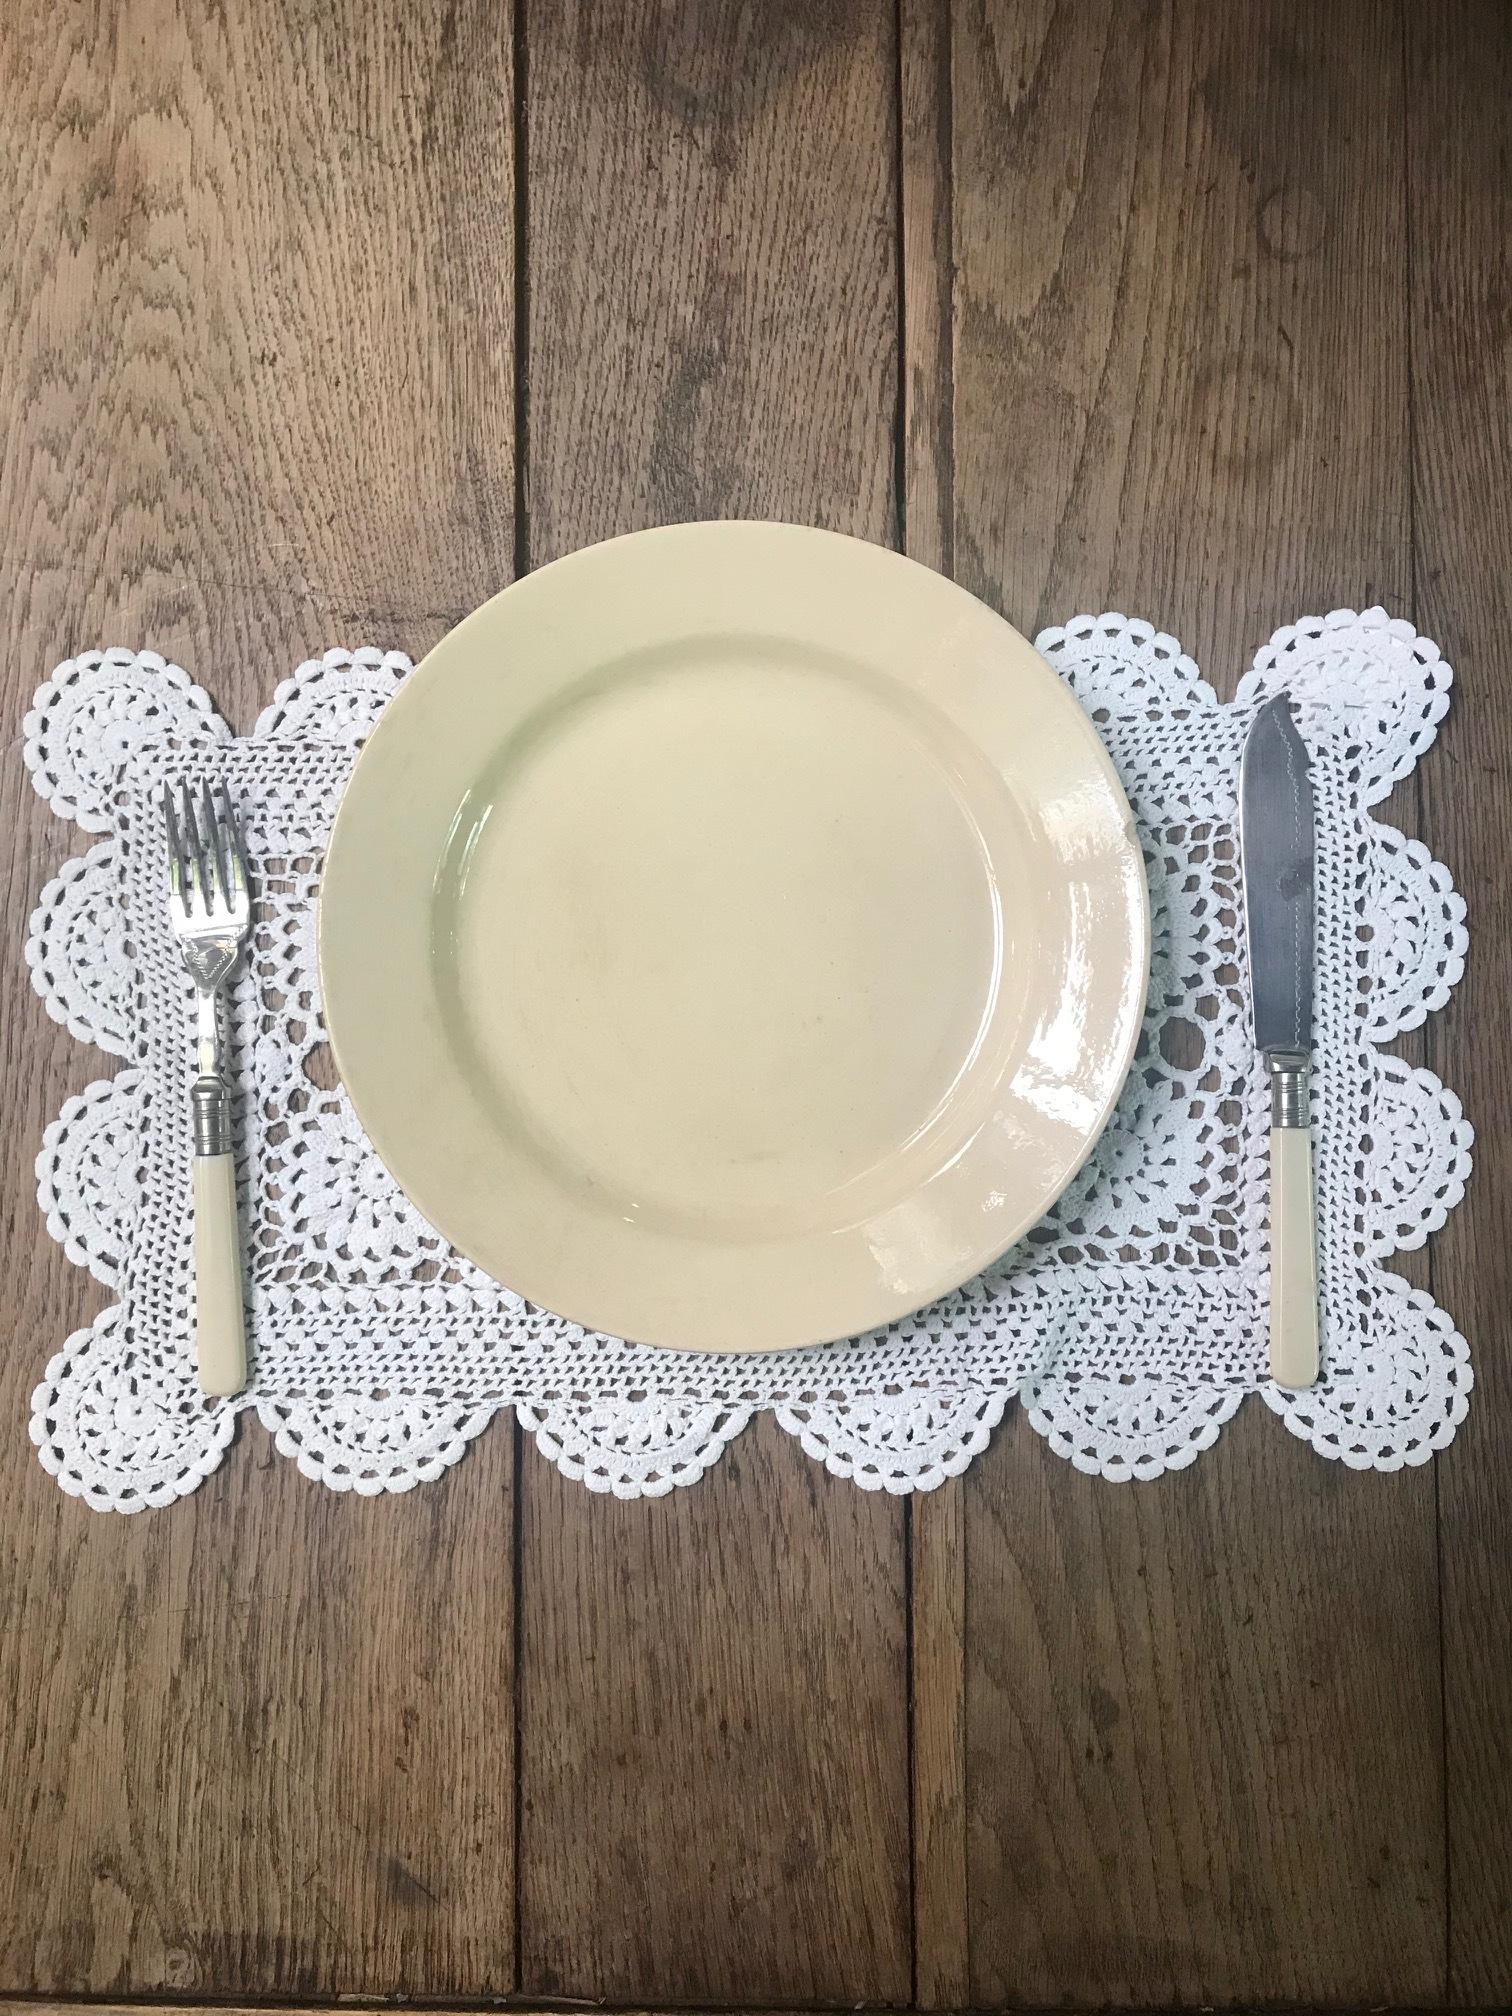 Boch Frères ベルギーアンティーク ディナープレート 皿A